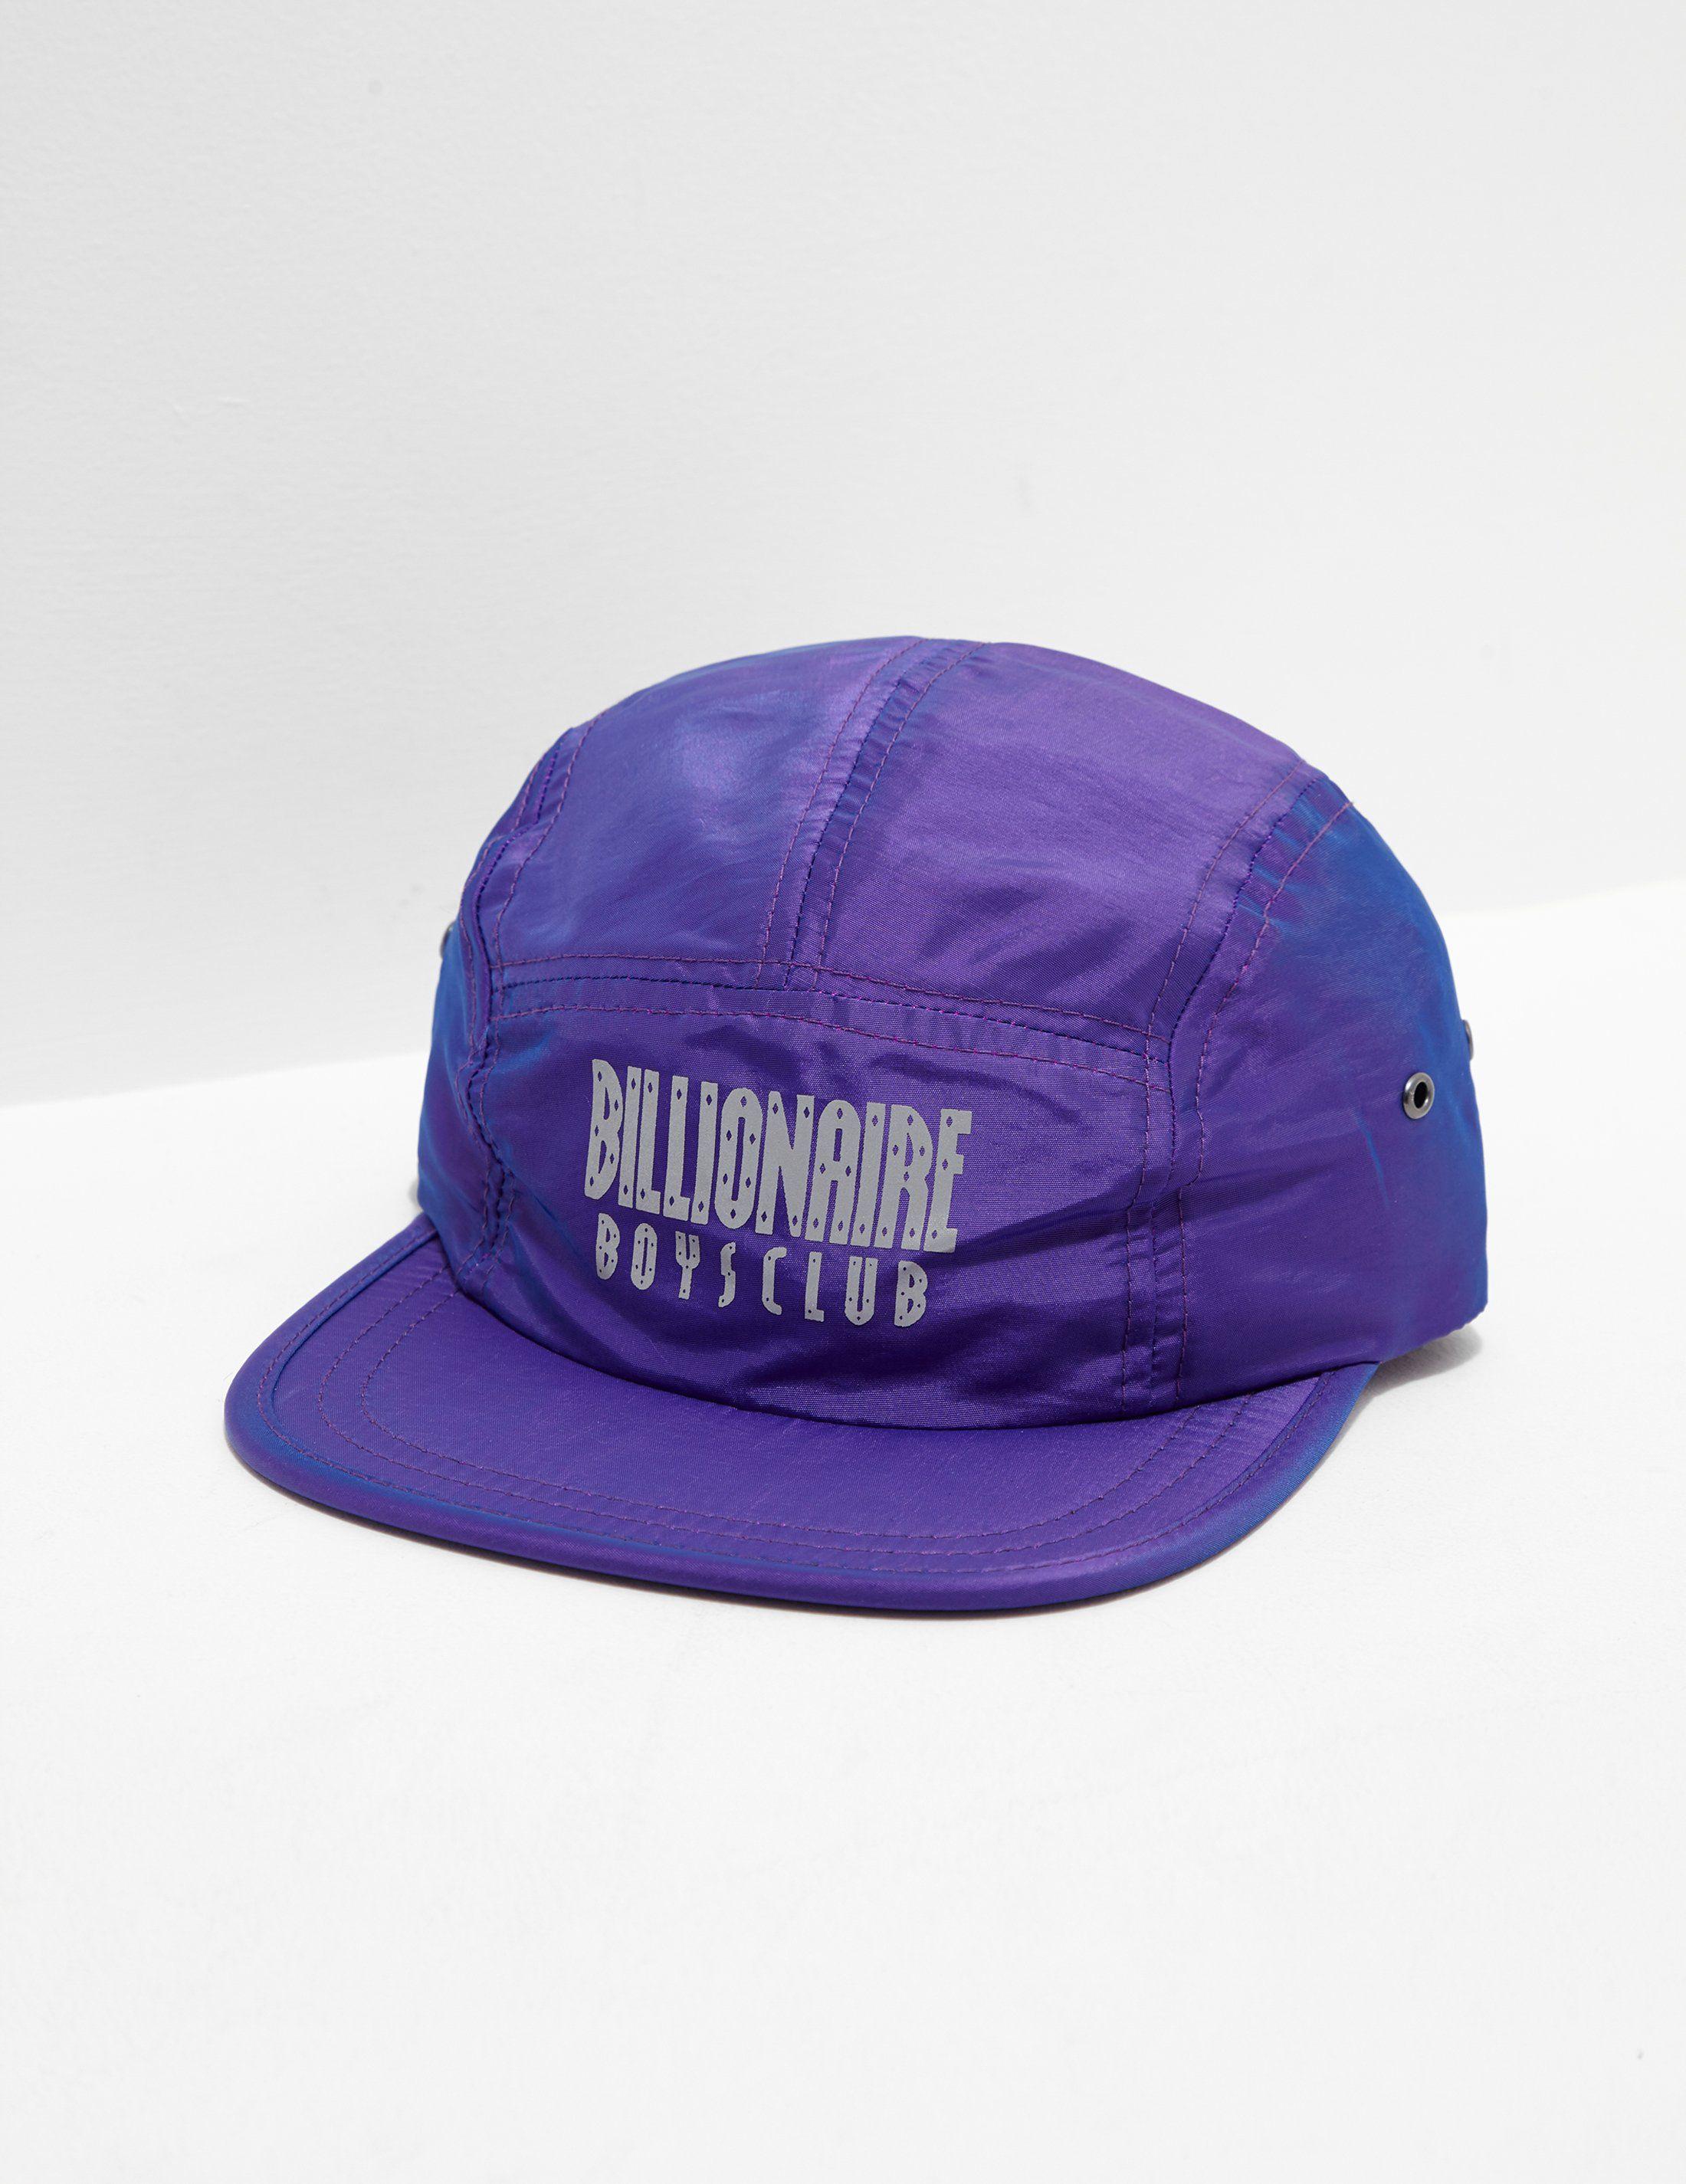 Billionaire Boys Club Iridescent Cap - Online Exclusive